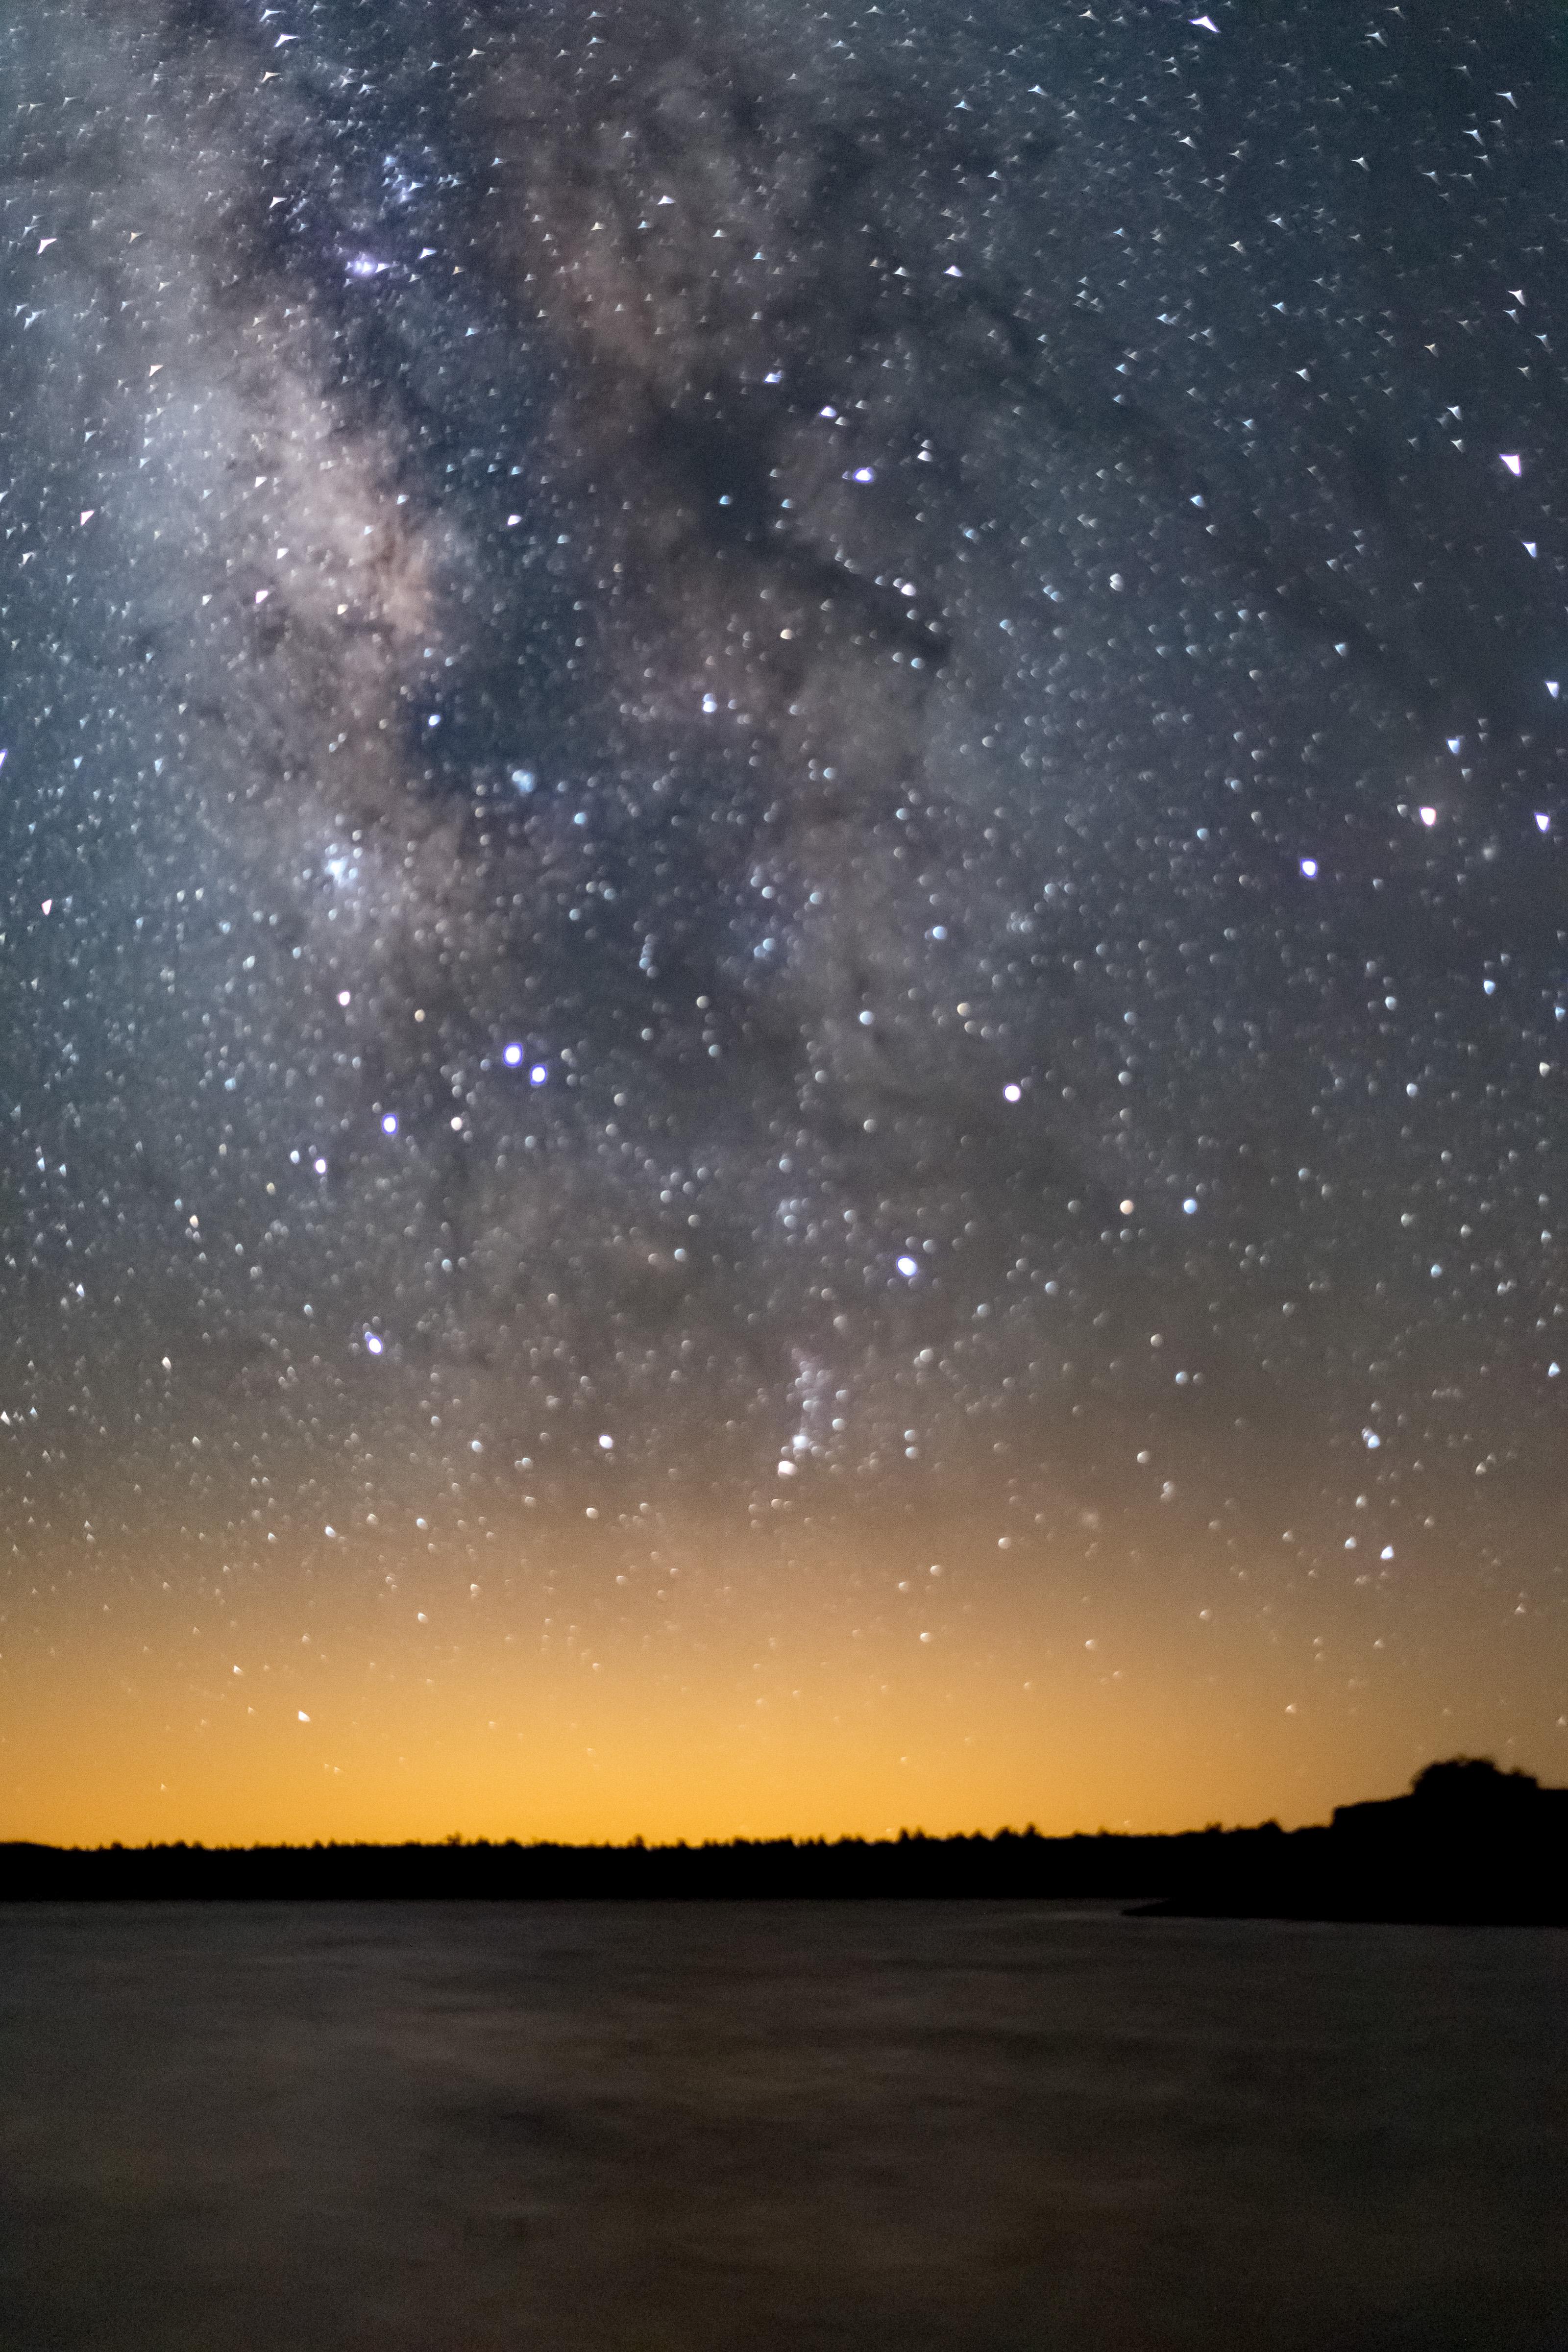 Milky way over ashurst lake photo